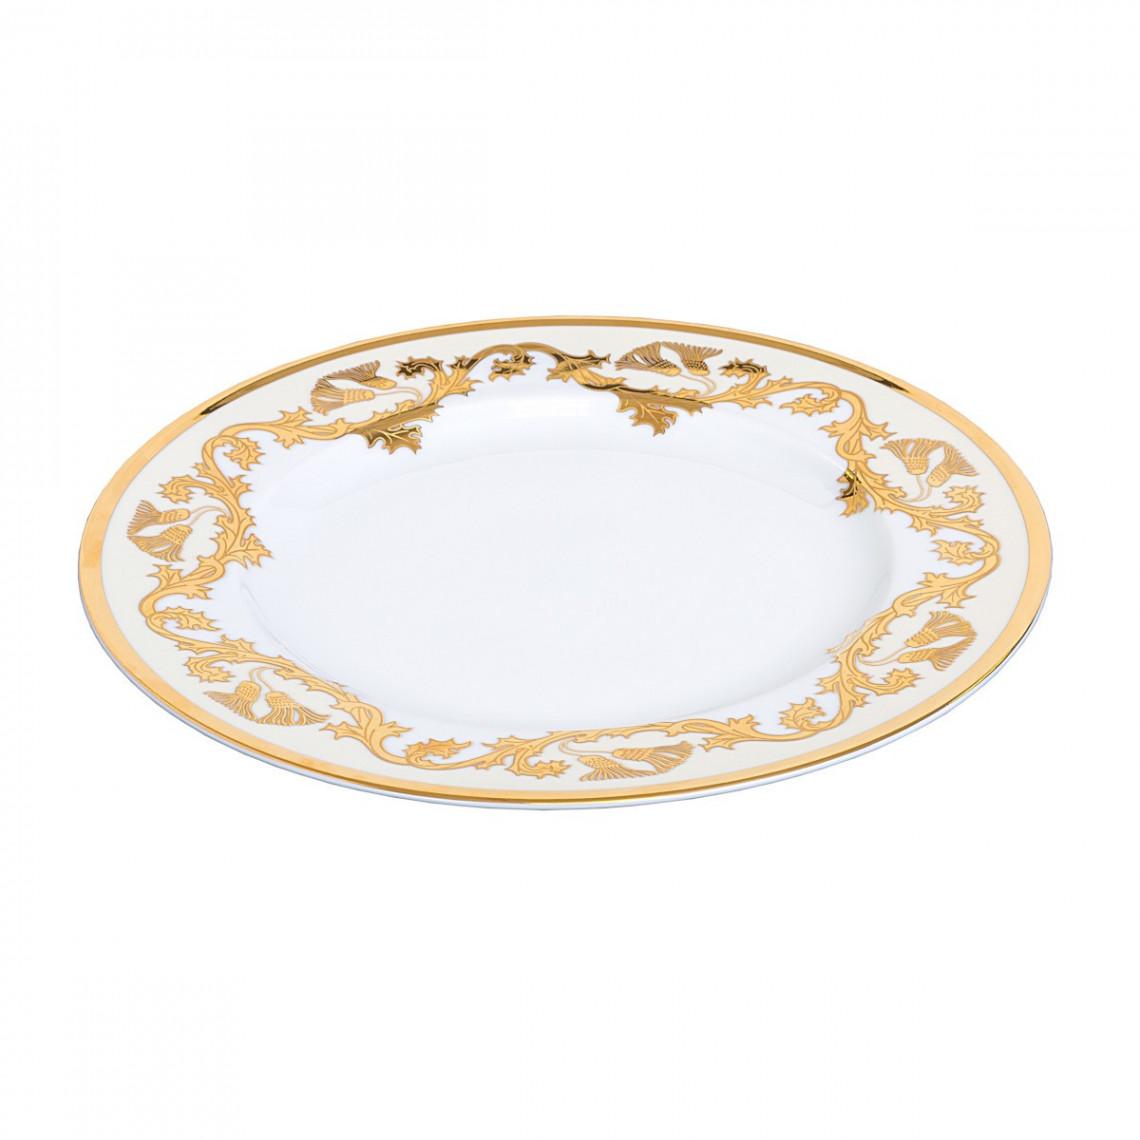 Assiette repas Versailles (Ø26